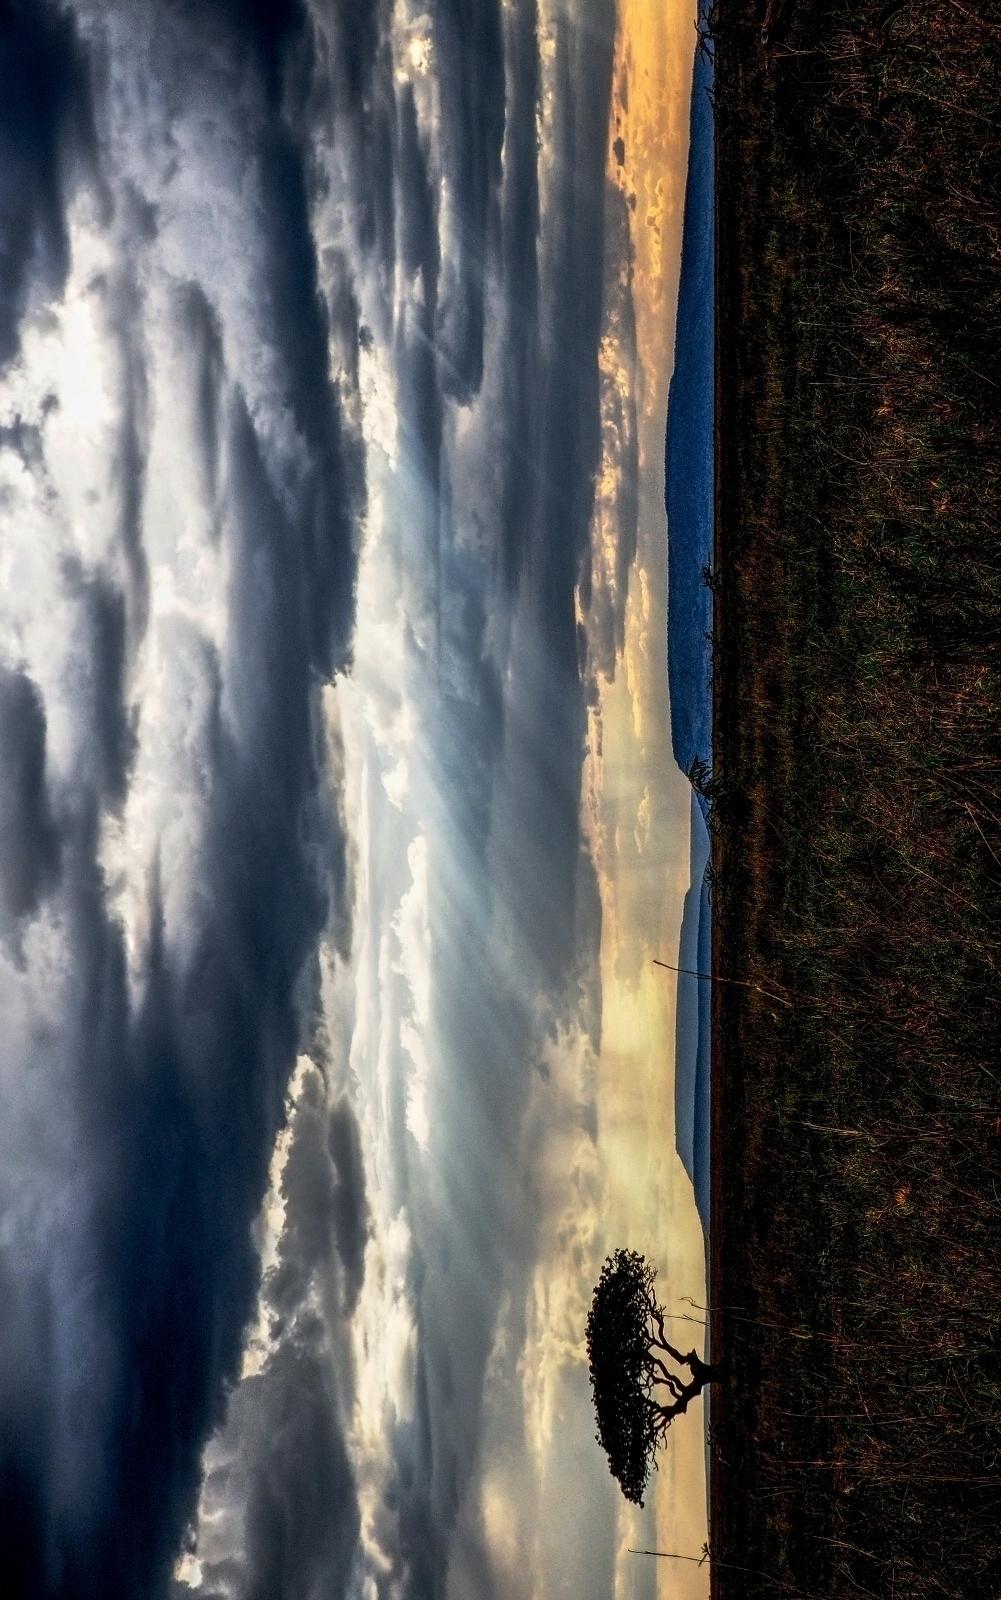 <h5>Clouds</h5><p>By Nick Ambrose </p>